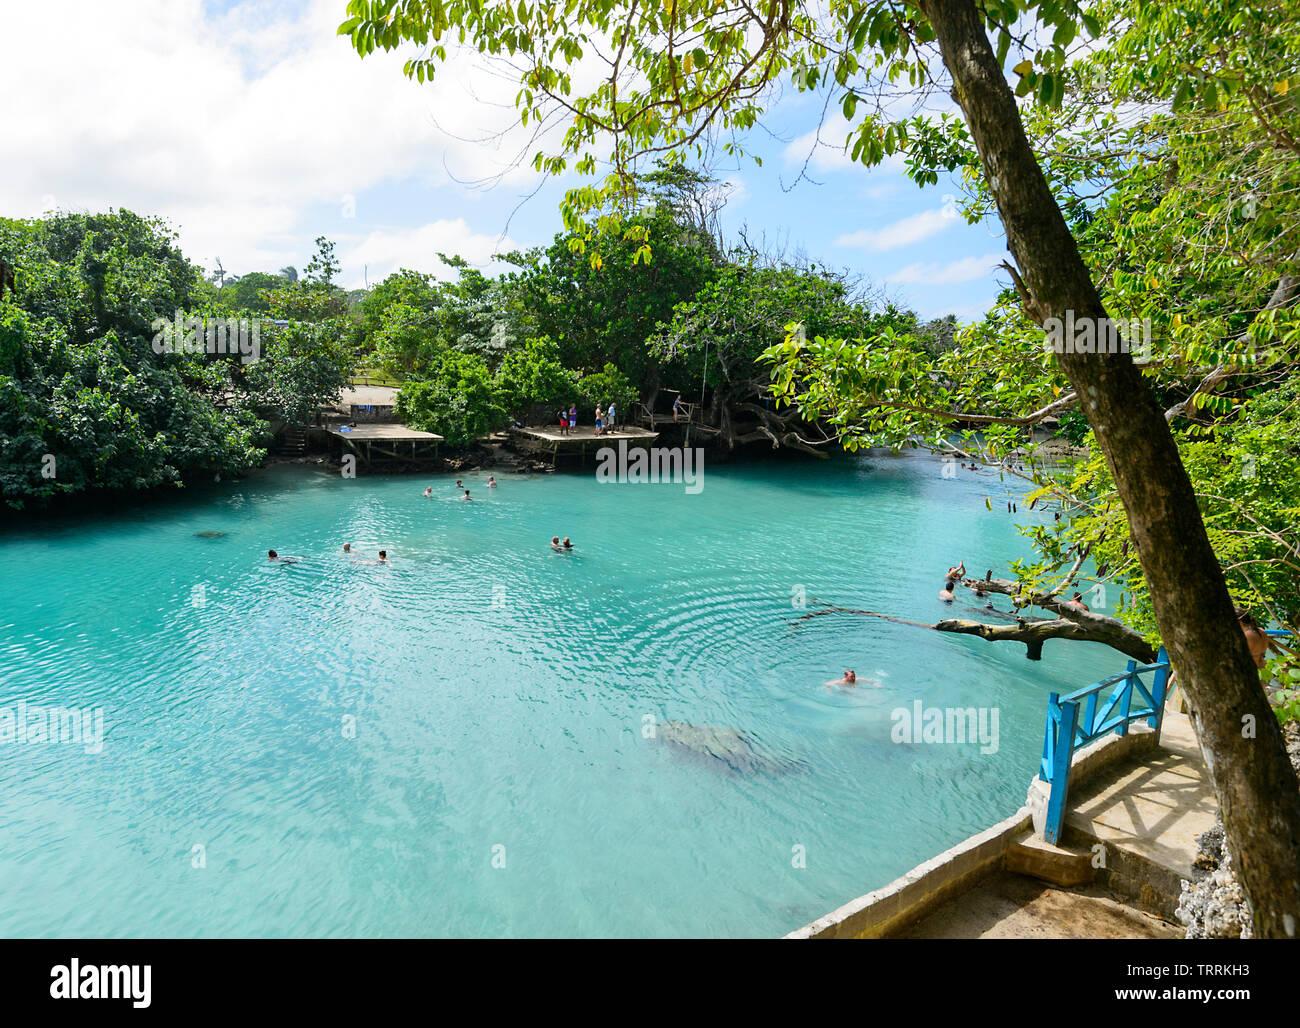 People swimming in Blue Lagoon, a popular scenic turquoise swimming hole near Port Vila, Efate Island, Vanuatu, Melanesia Stock Photo